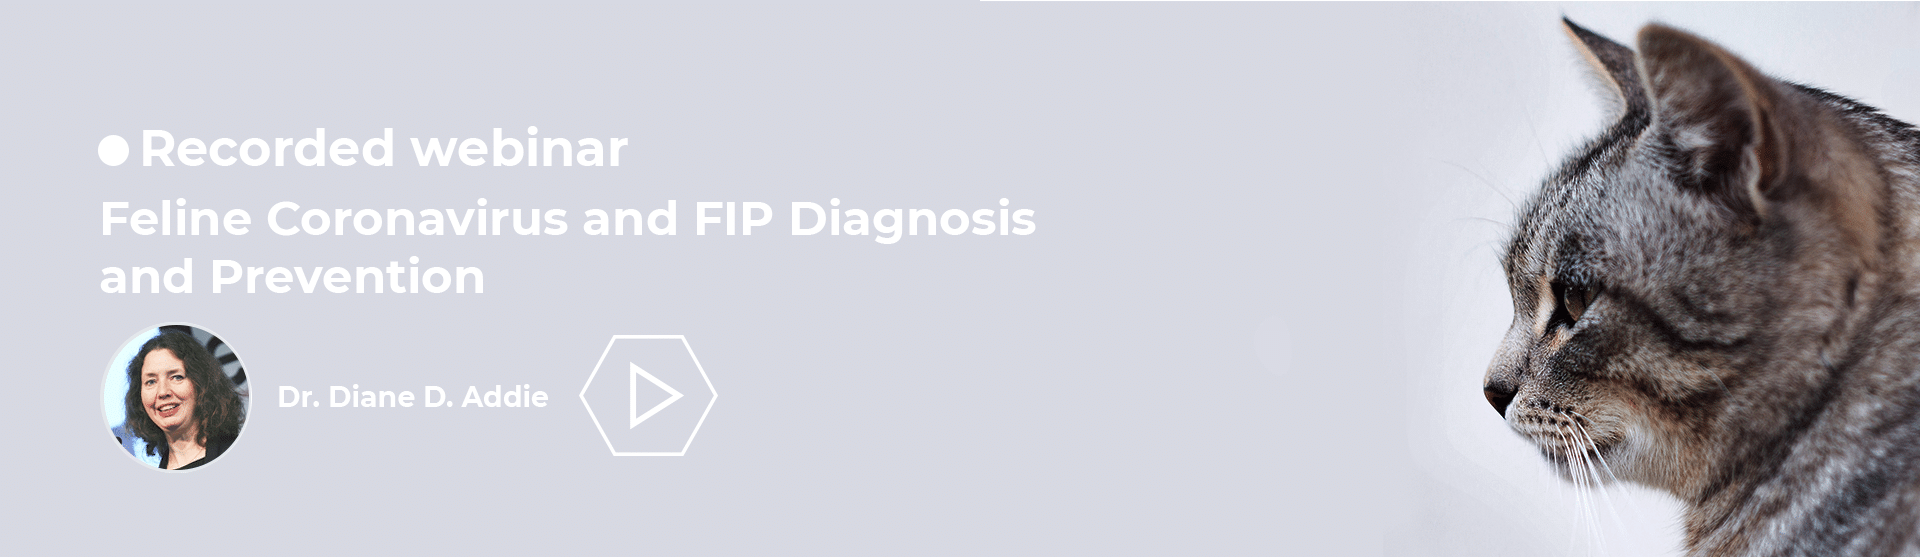 Feline Coronavirus and FIP Diagnosis and Prevention